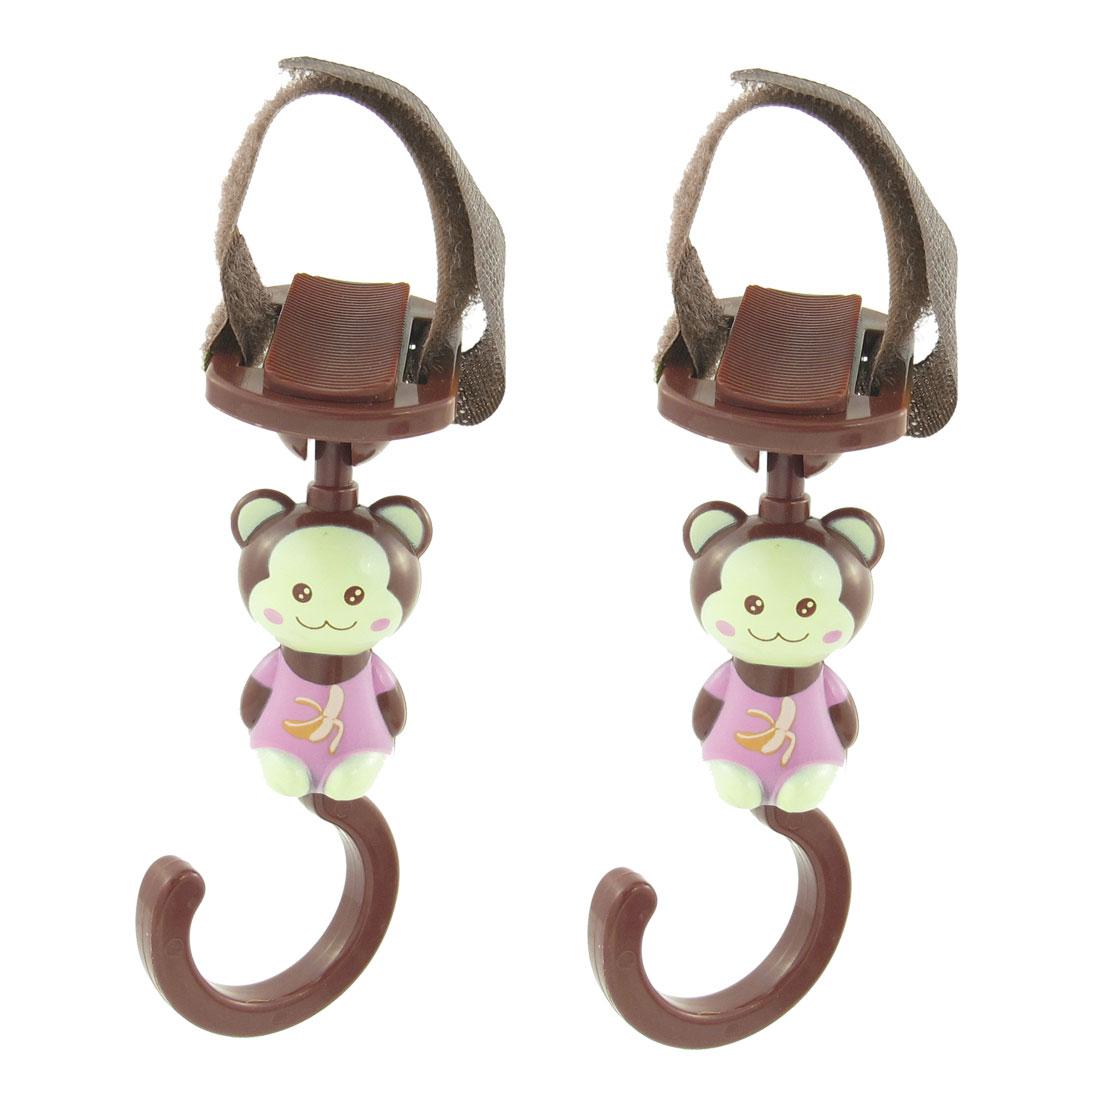 2 PCS Portable Brown Plastic Cartoon Monkey Design Hanger Hook Clasp